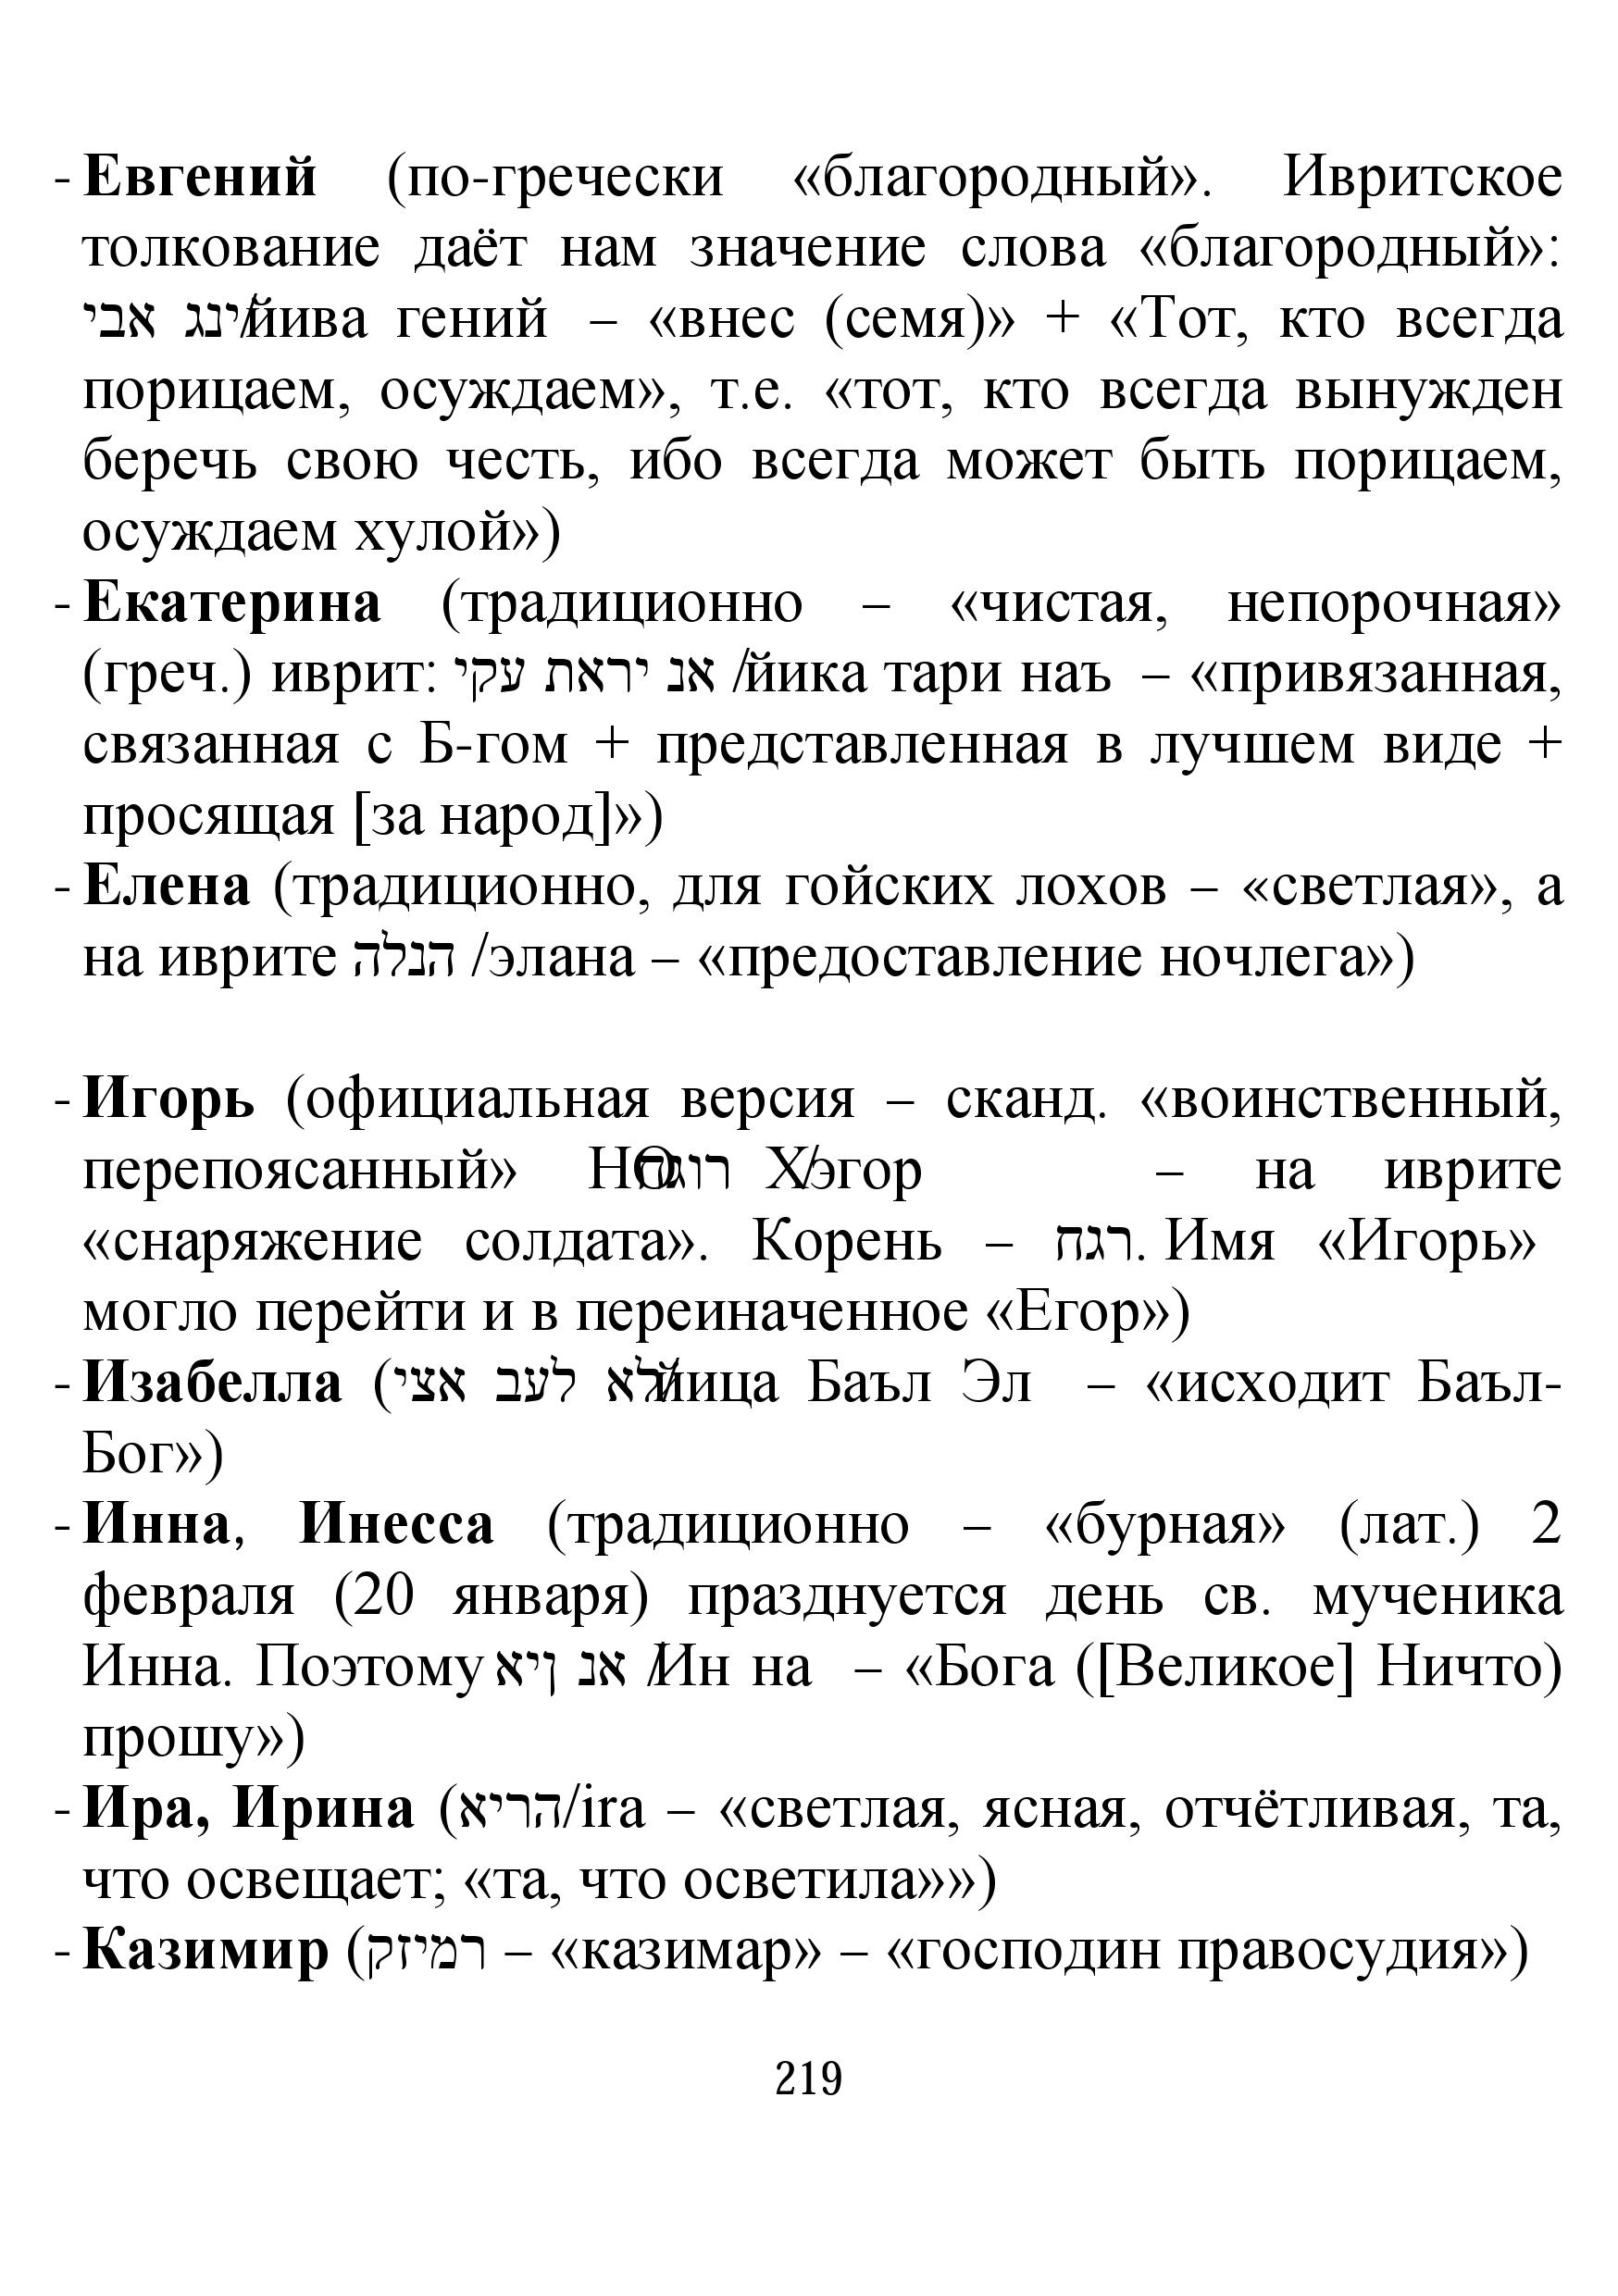 http://sg.uploads.ru/yBvjx.jpg